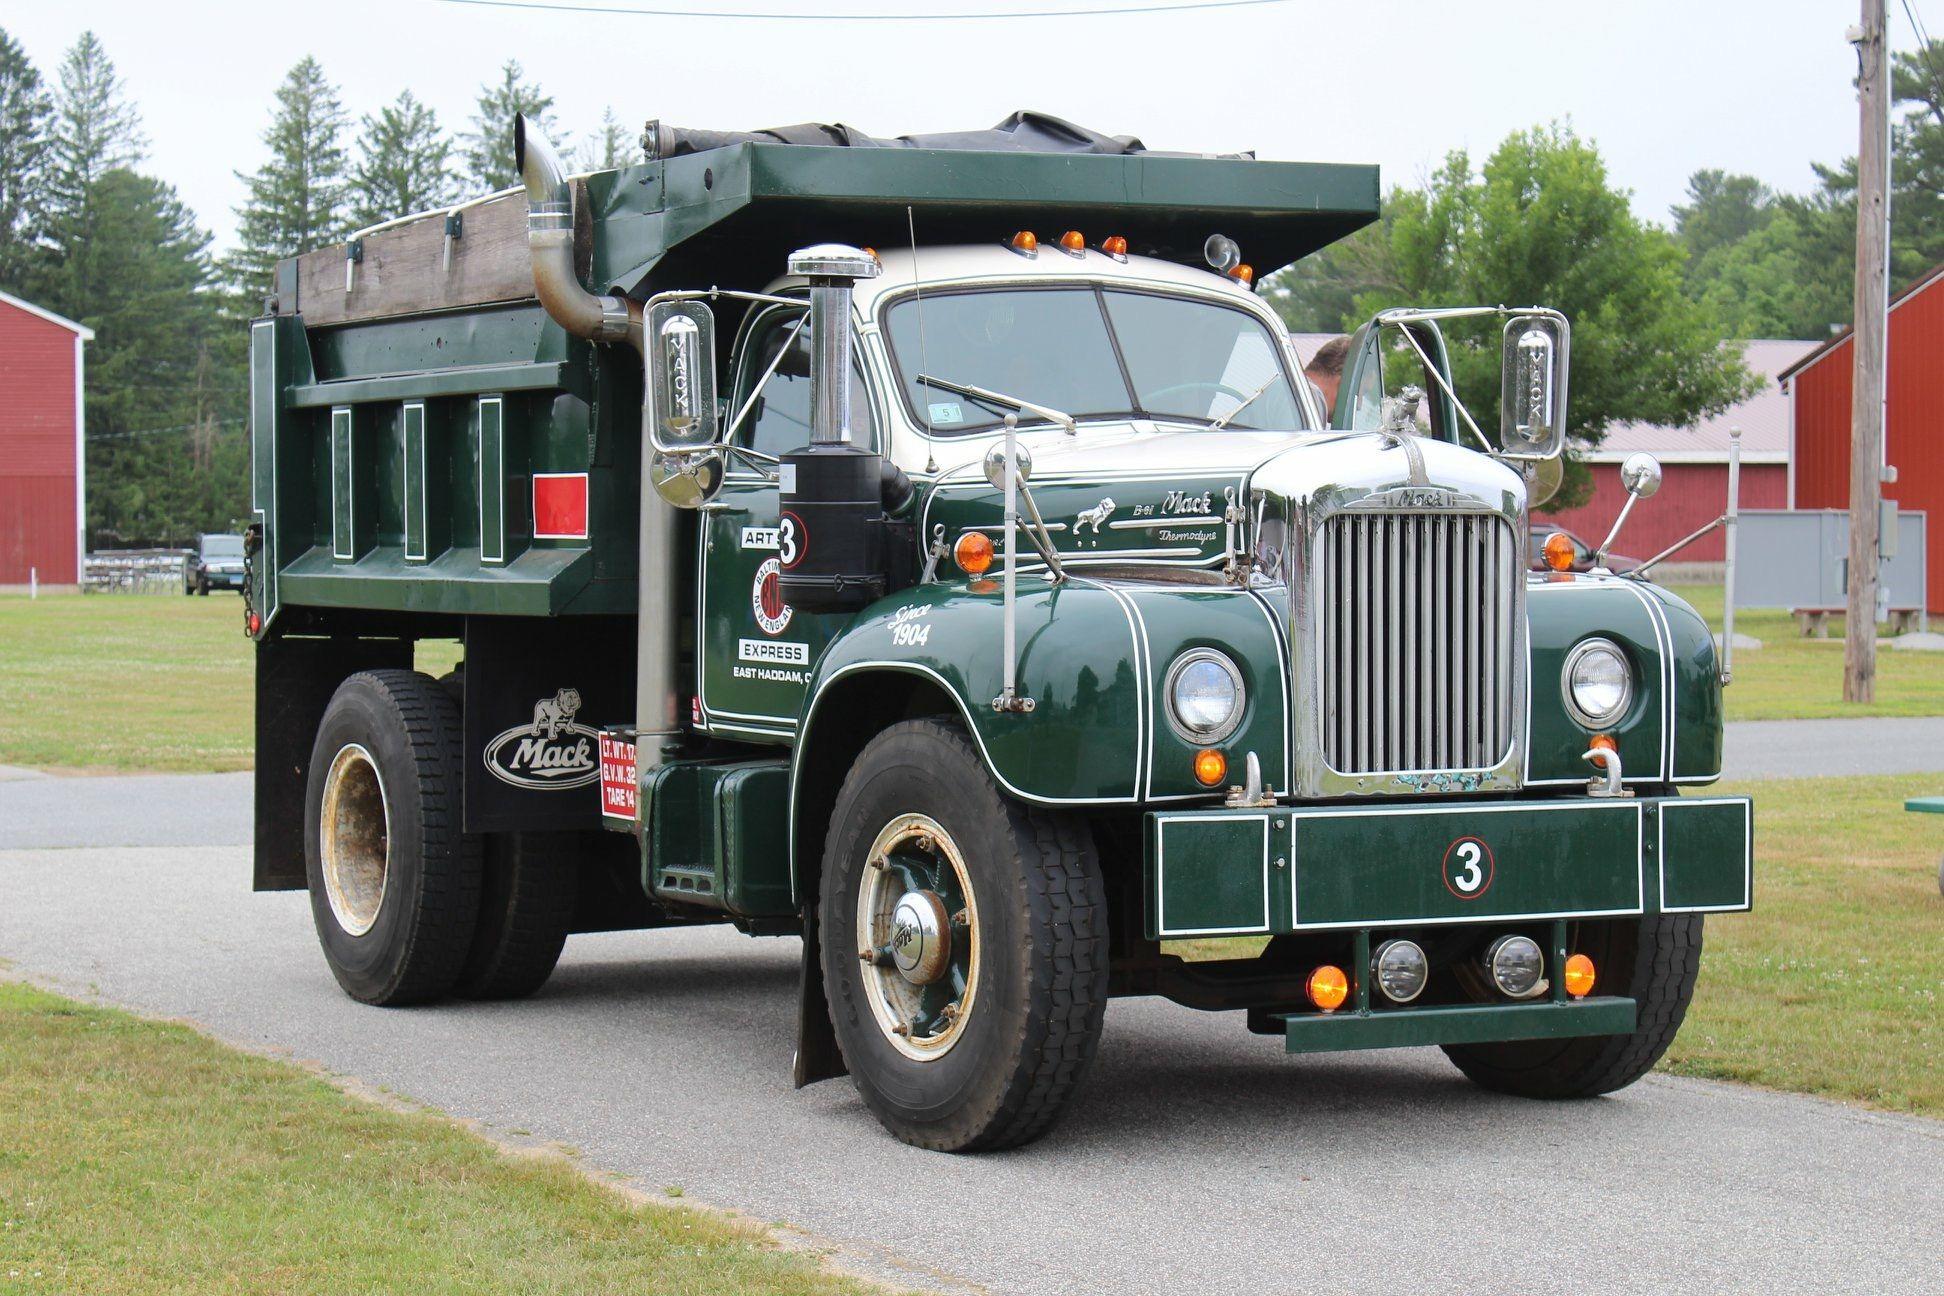 Mack B Model 6 Wheel Dump Truck Mack Trucks Dump Trucks Heavy Truck